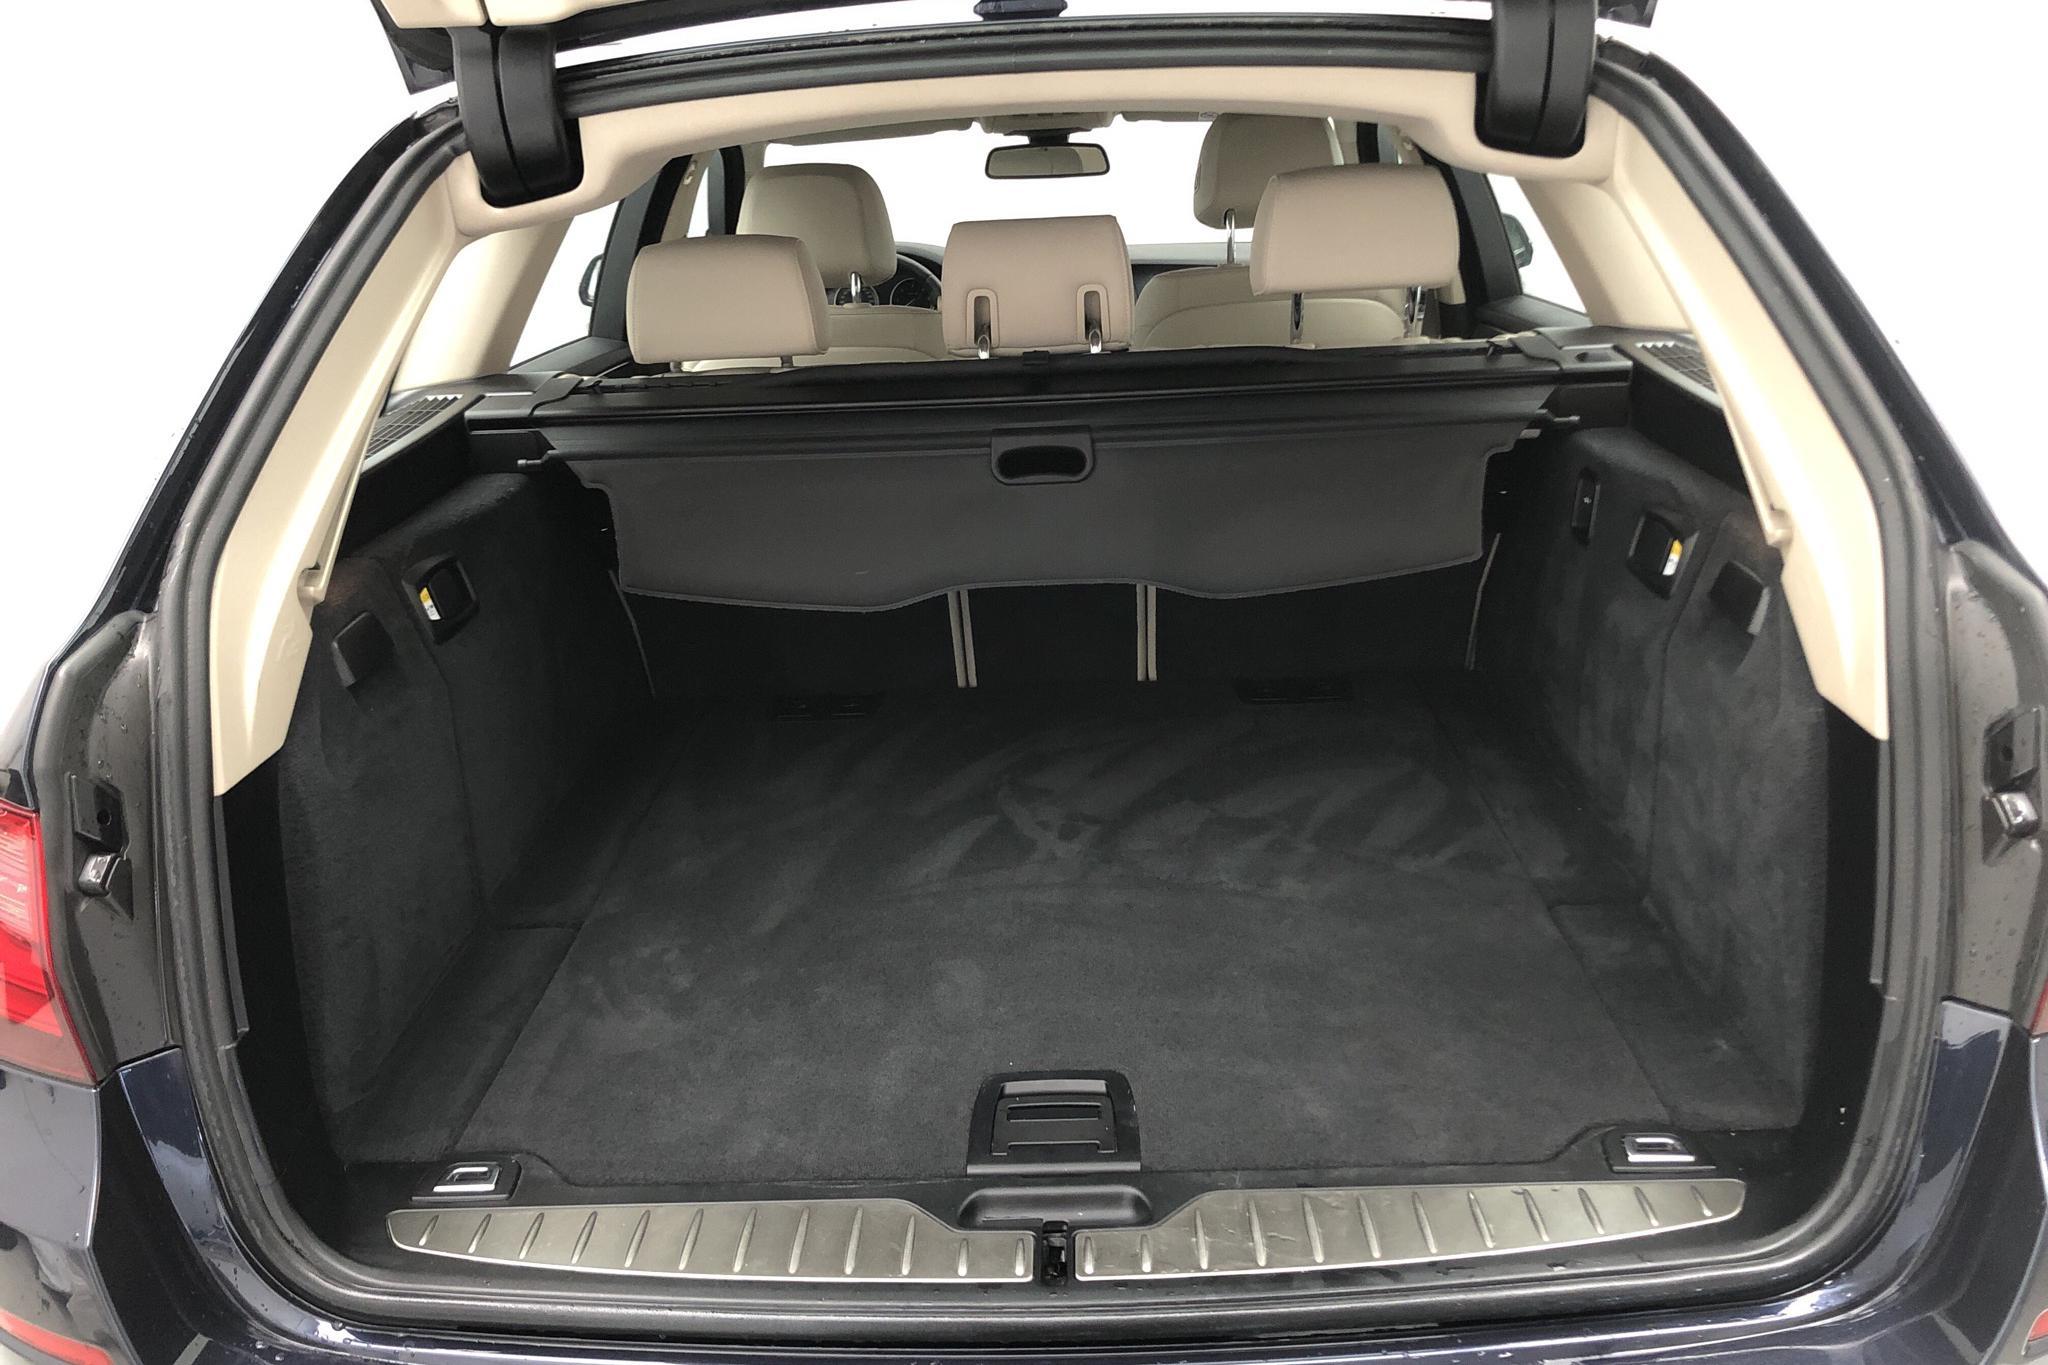 BMW 520d xDrive Touring, F11 (190hk) - 62 050 km - Automatic - blue - 2017